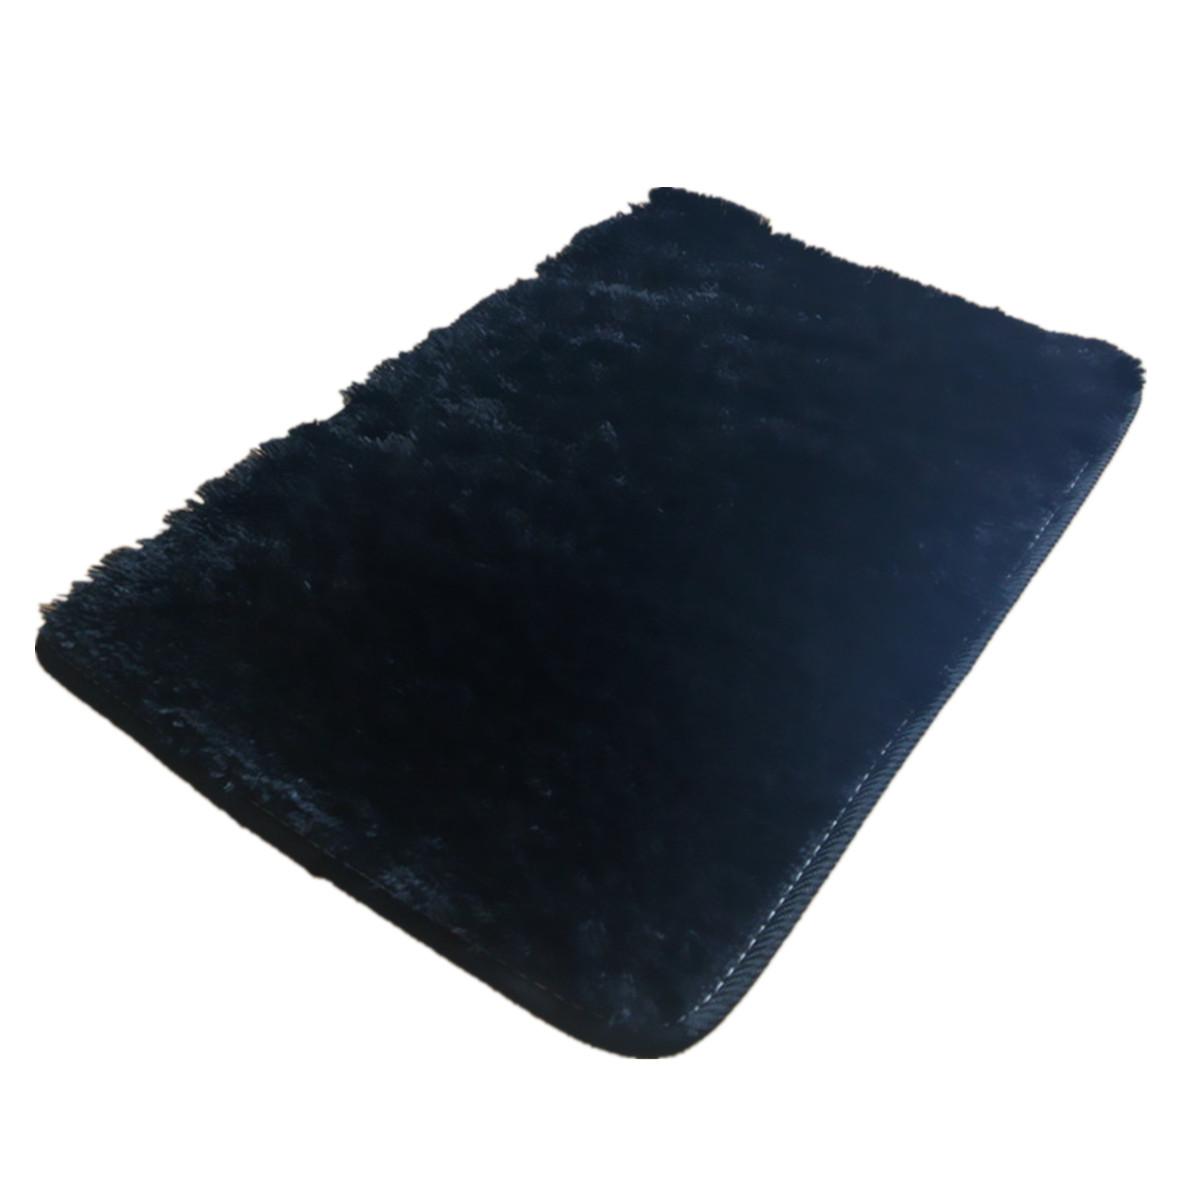 2Pcs Fluffy Anti skid Shaggy Area Rug Yoga Carpet Home